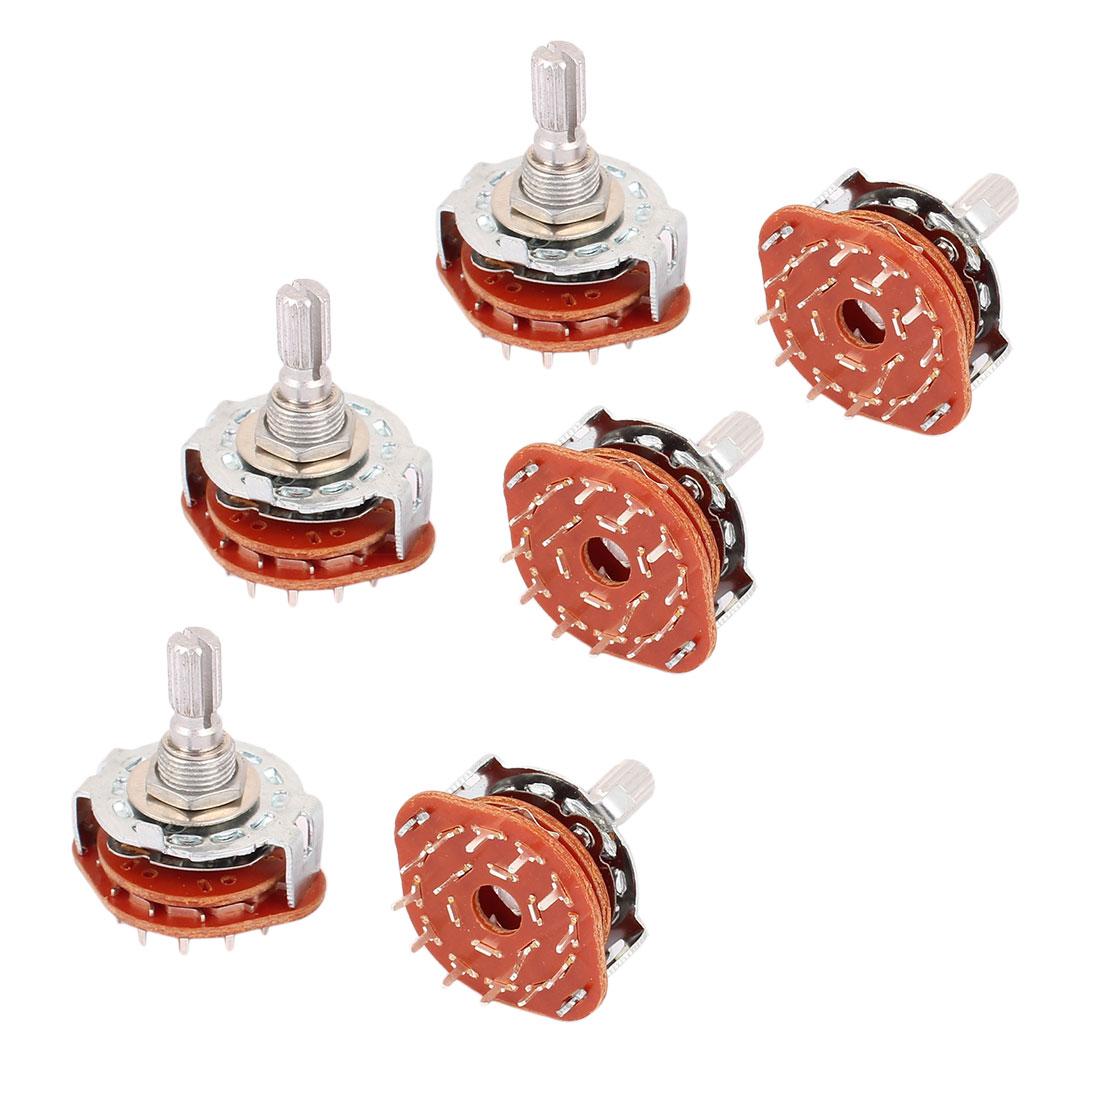 6 Pcs 6mm Split Shaft AC 125V 0.3A 250V 0.6A 2P6T Rotary Switch